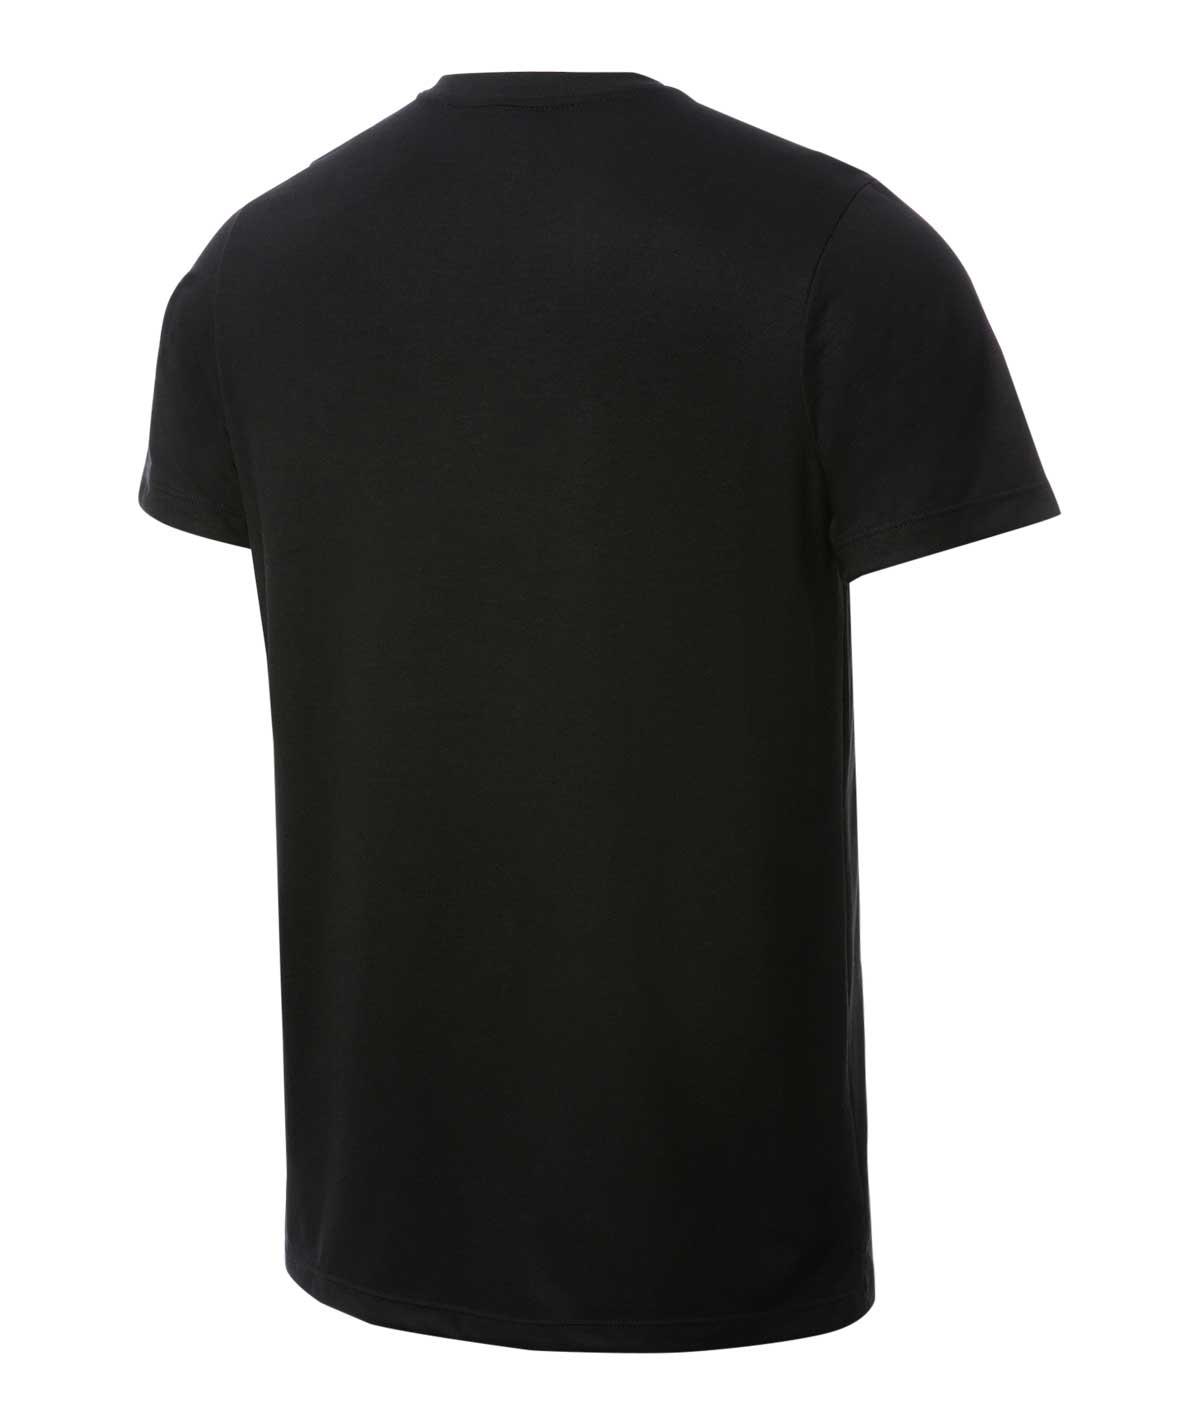 Camisa Retrô Gol Basílio Gol Preta Torcedor